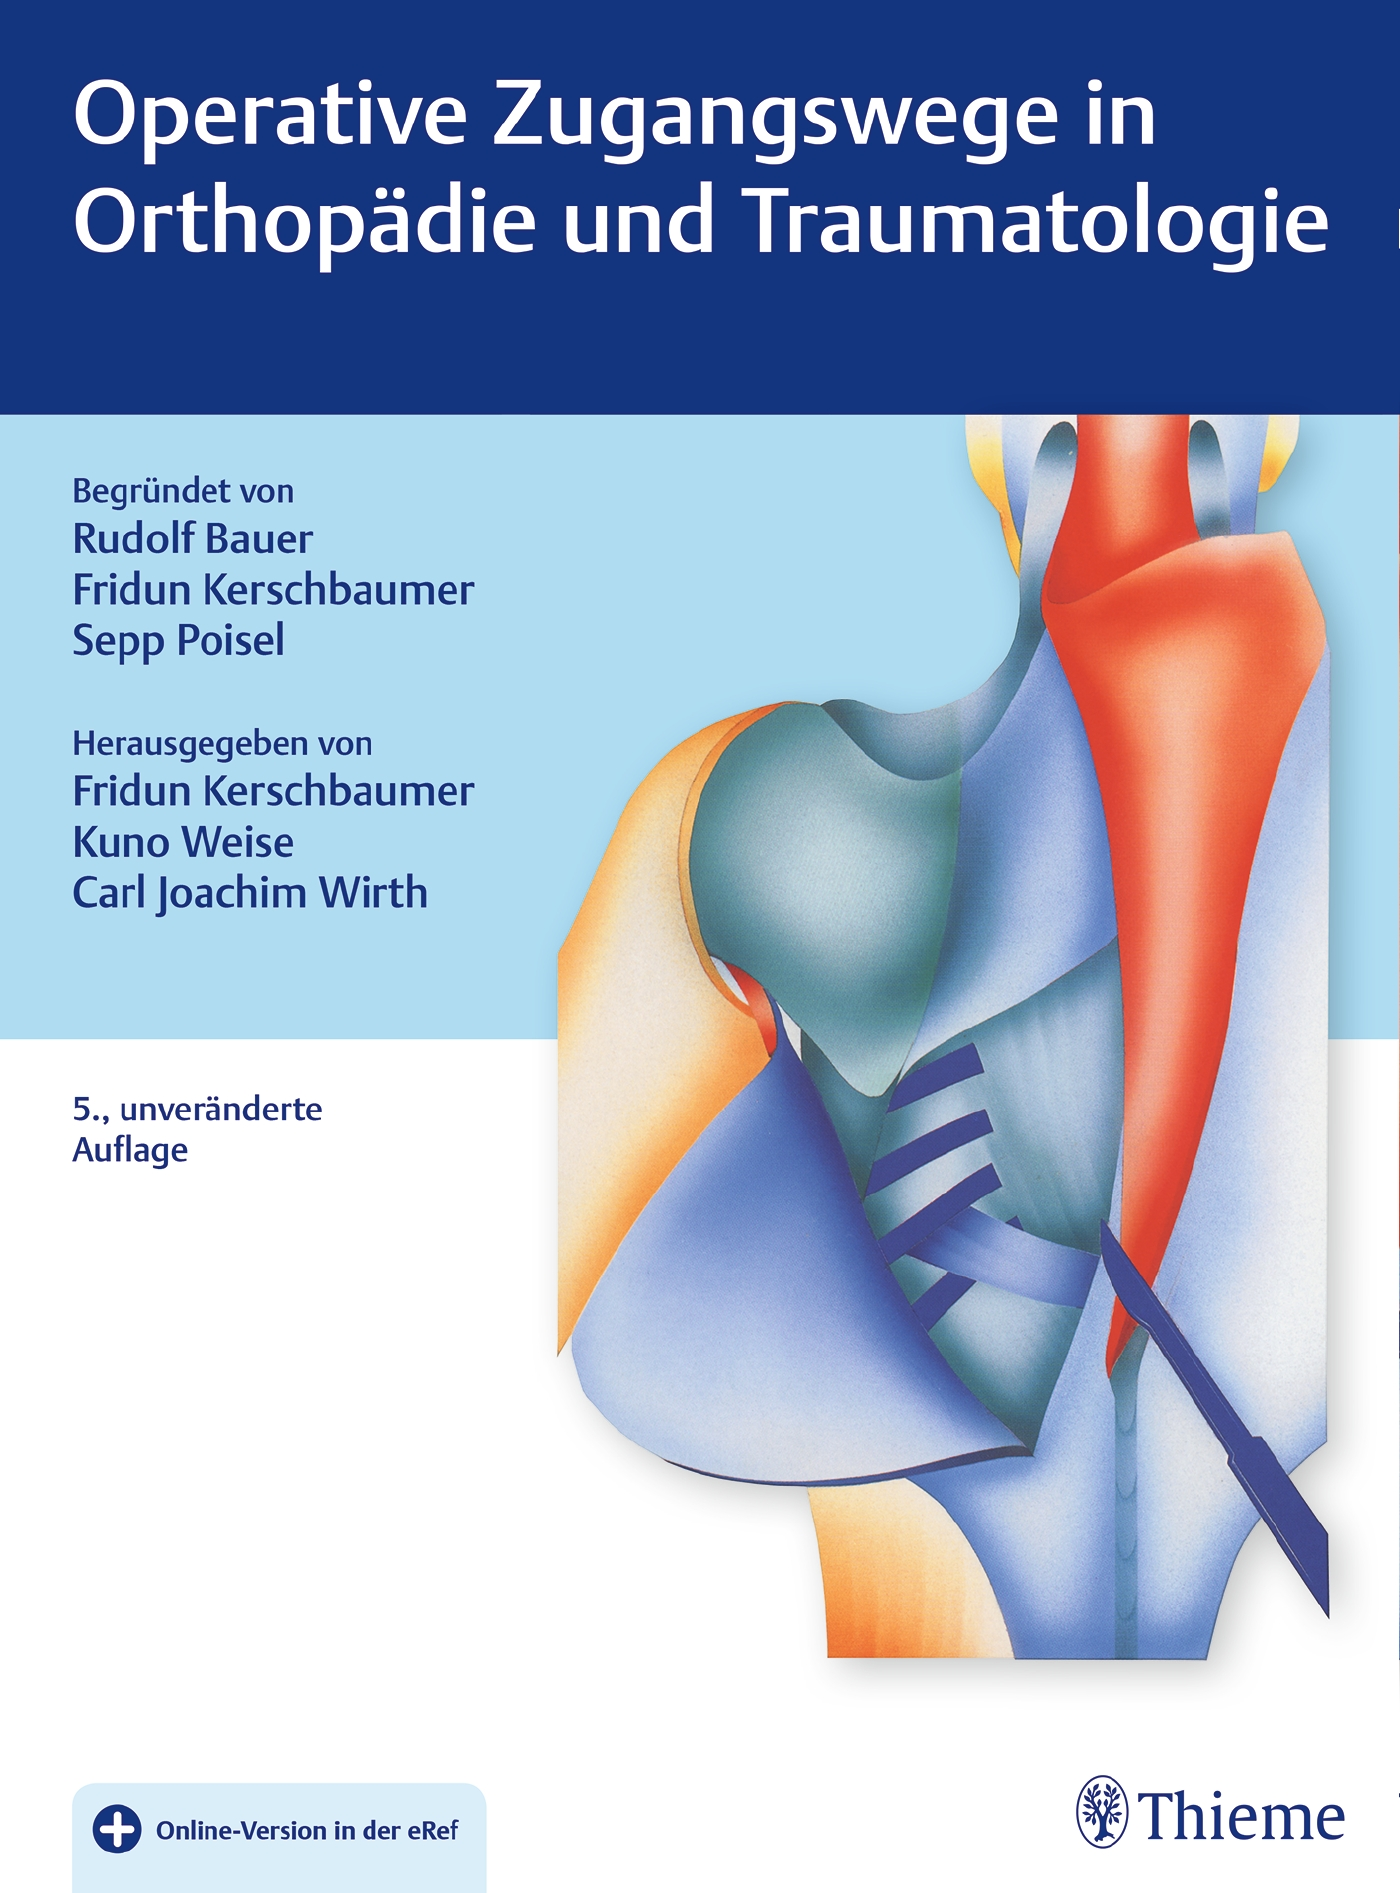 Operative Zugangswege in Orthopädie und Traumatologie